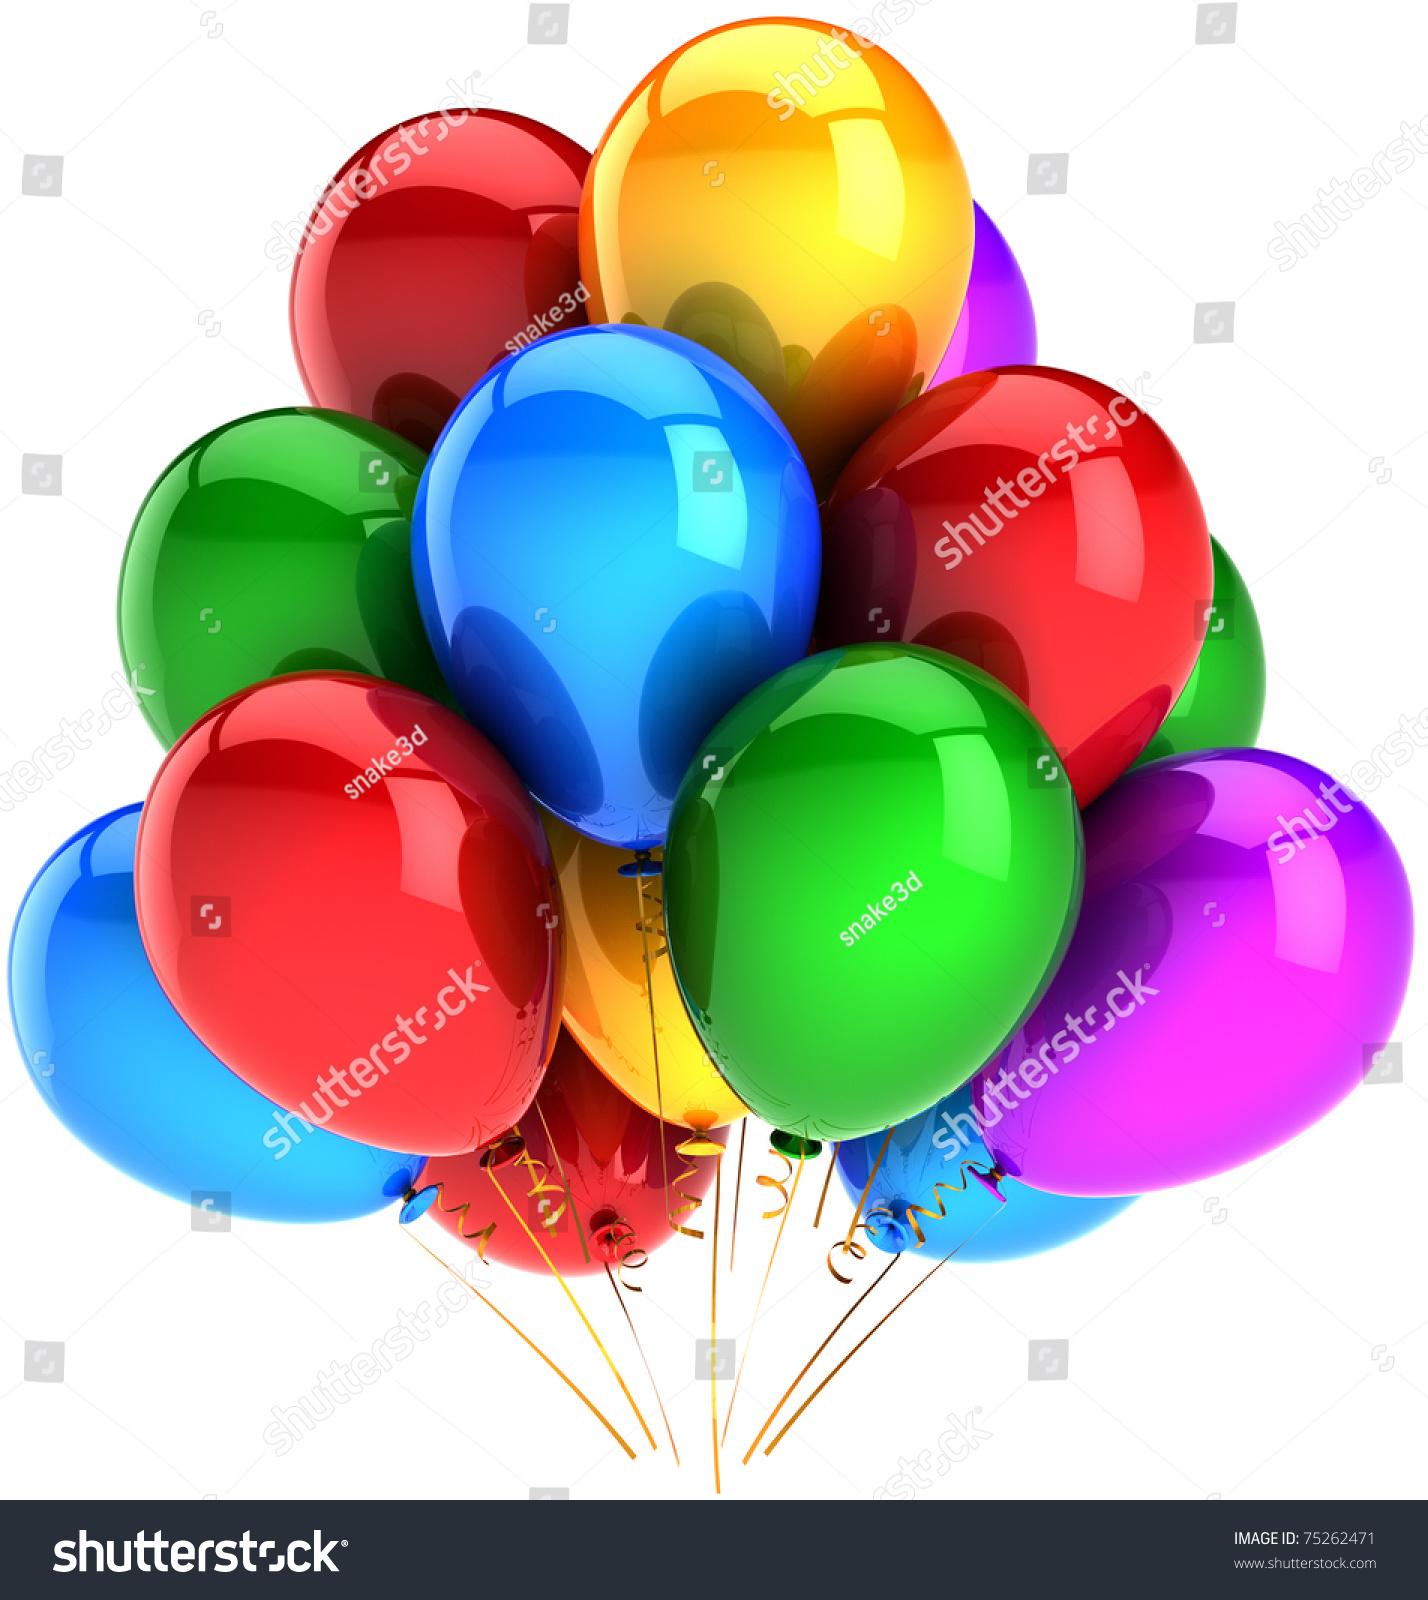 party balloons happy birthday balloon decoration stock illustration 75262471 shutterstock. Black Bedroom Furniture Sets. Home Design Ideas